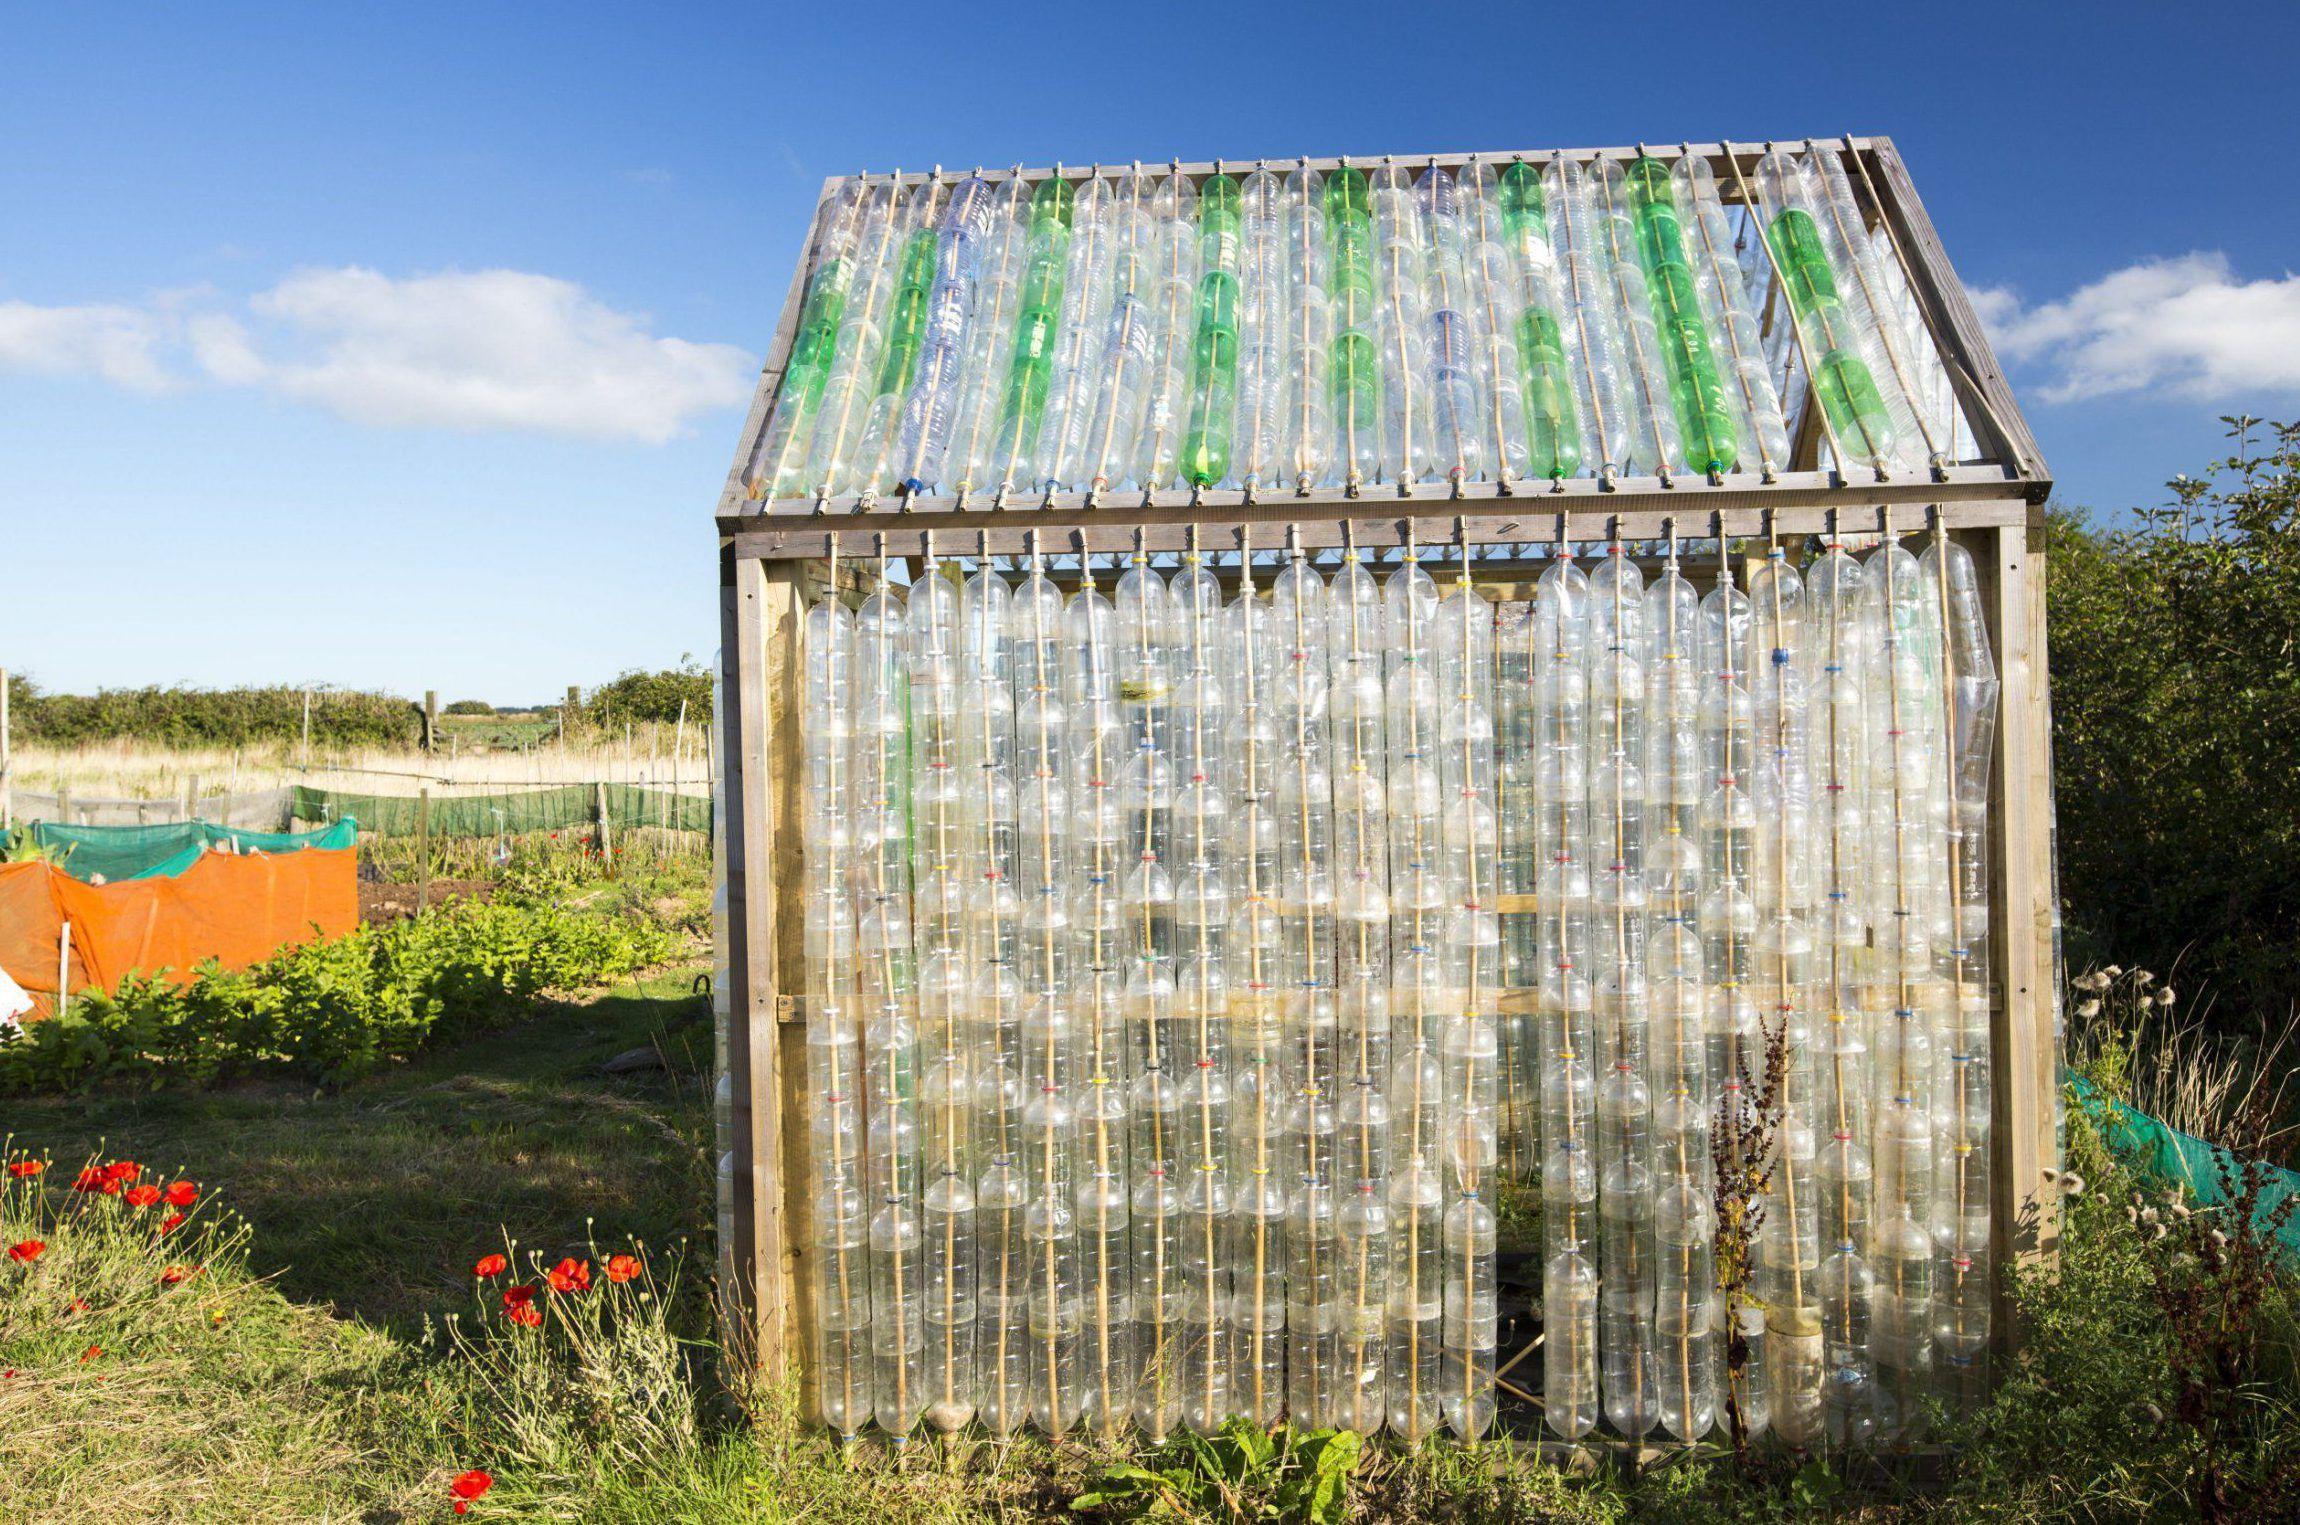 Recycle Plastic Bottles Greenhouse Diy